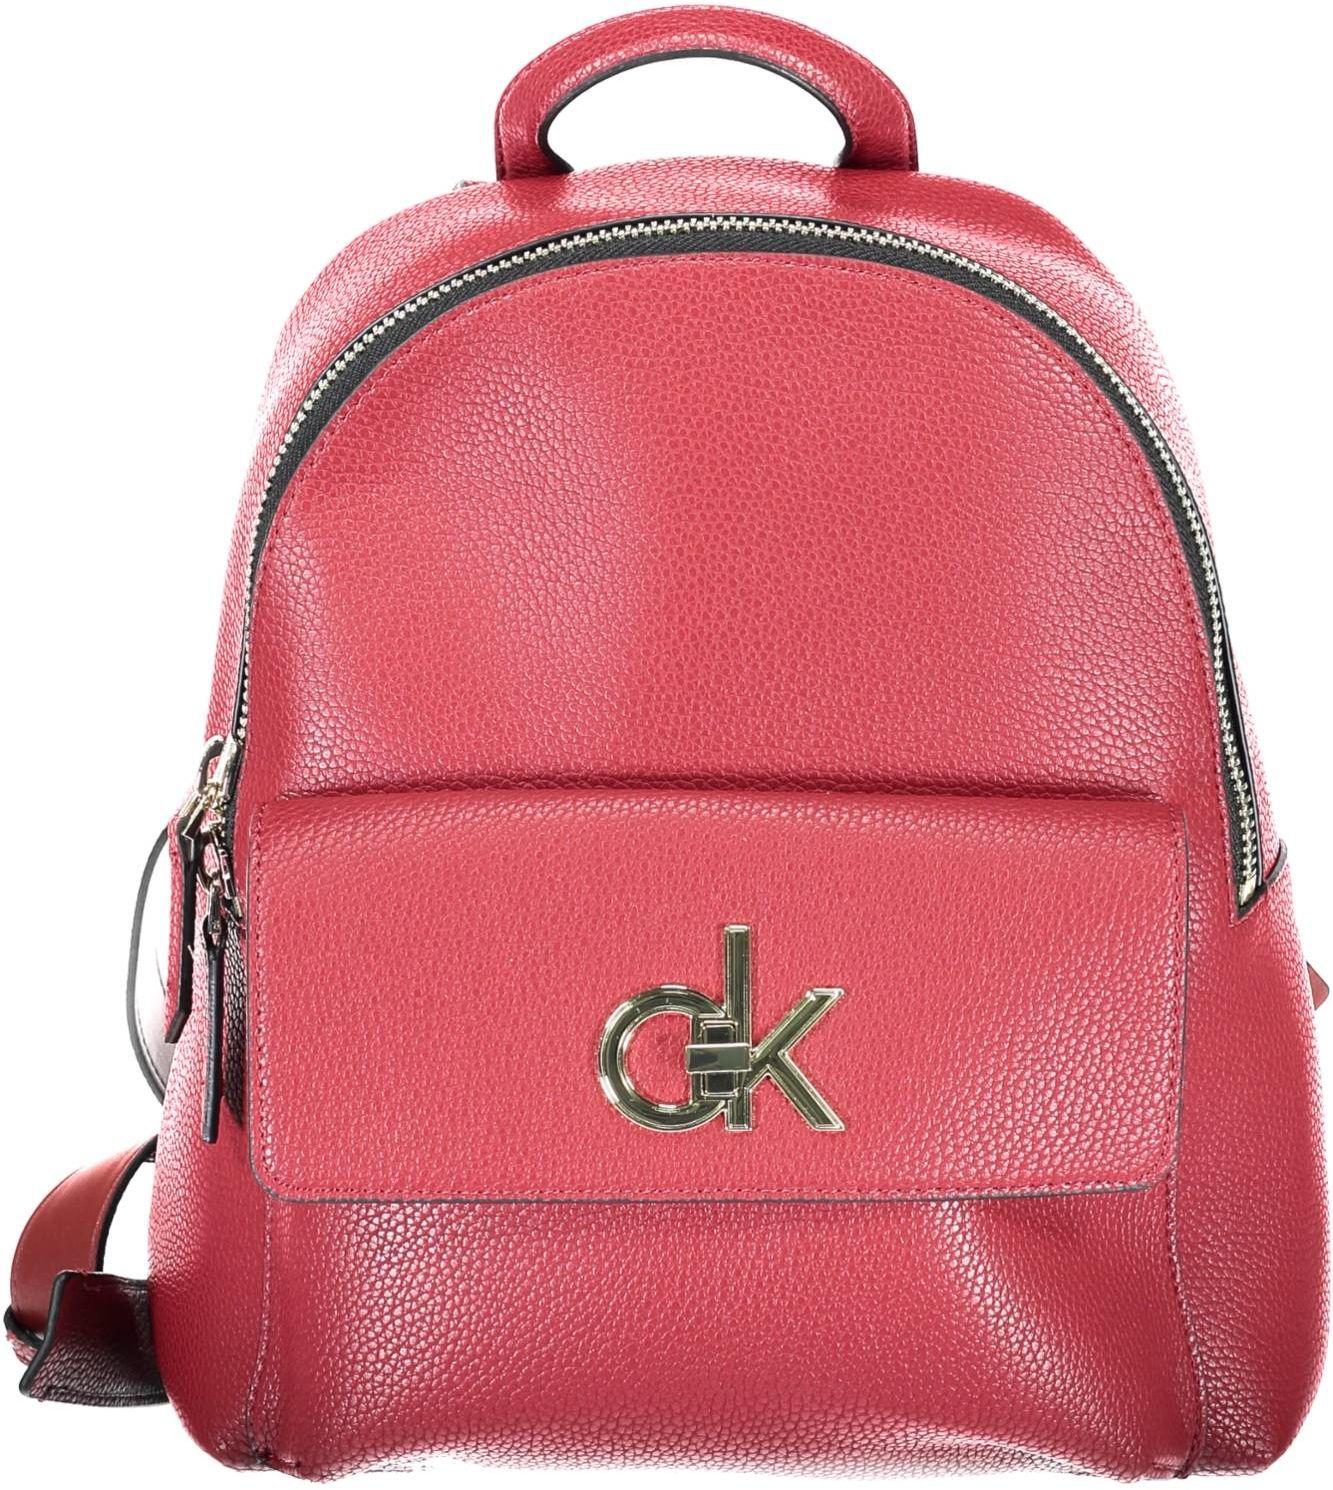 Plecak CALVIN KLEIN dla kobiet